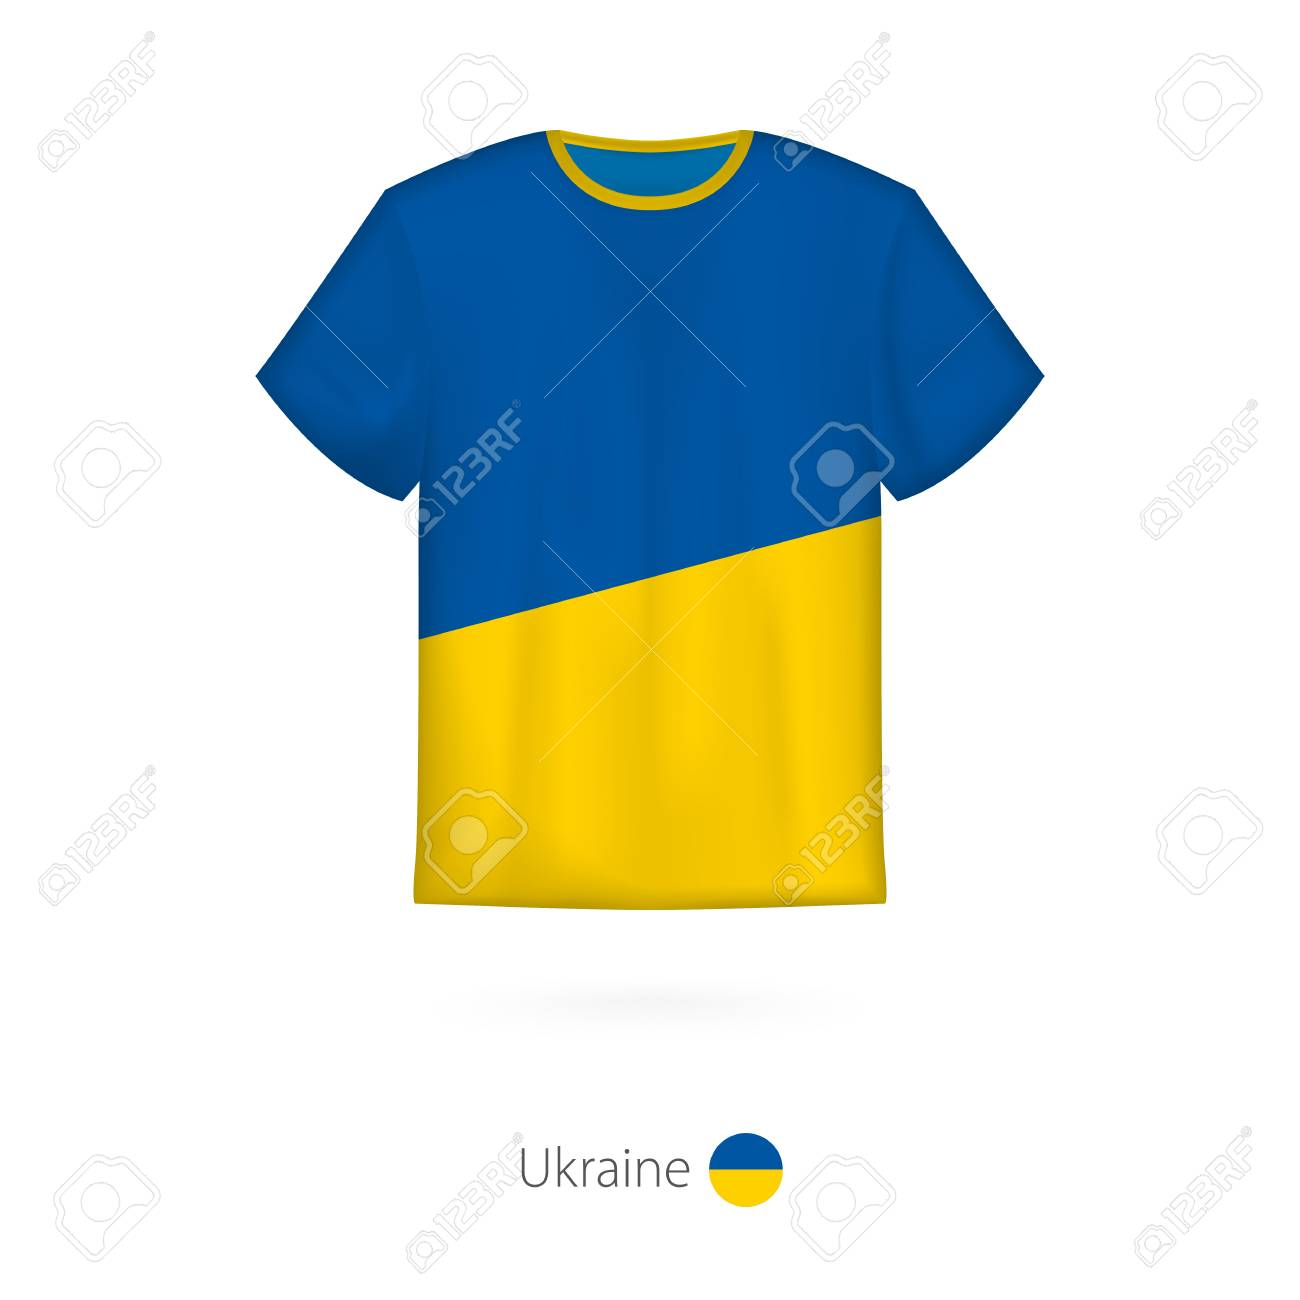 7c41d2358 T-shirt design with flag of Ukraine. T-shirt vector template. Stock